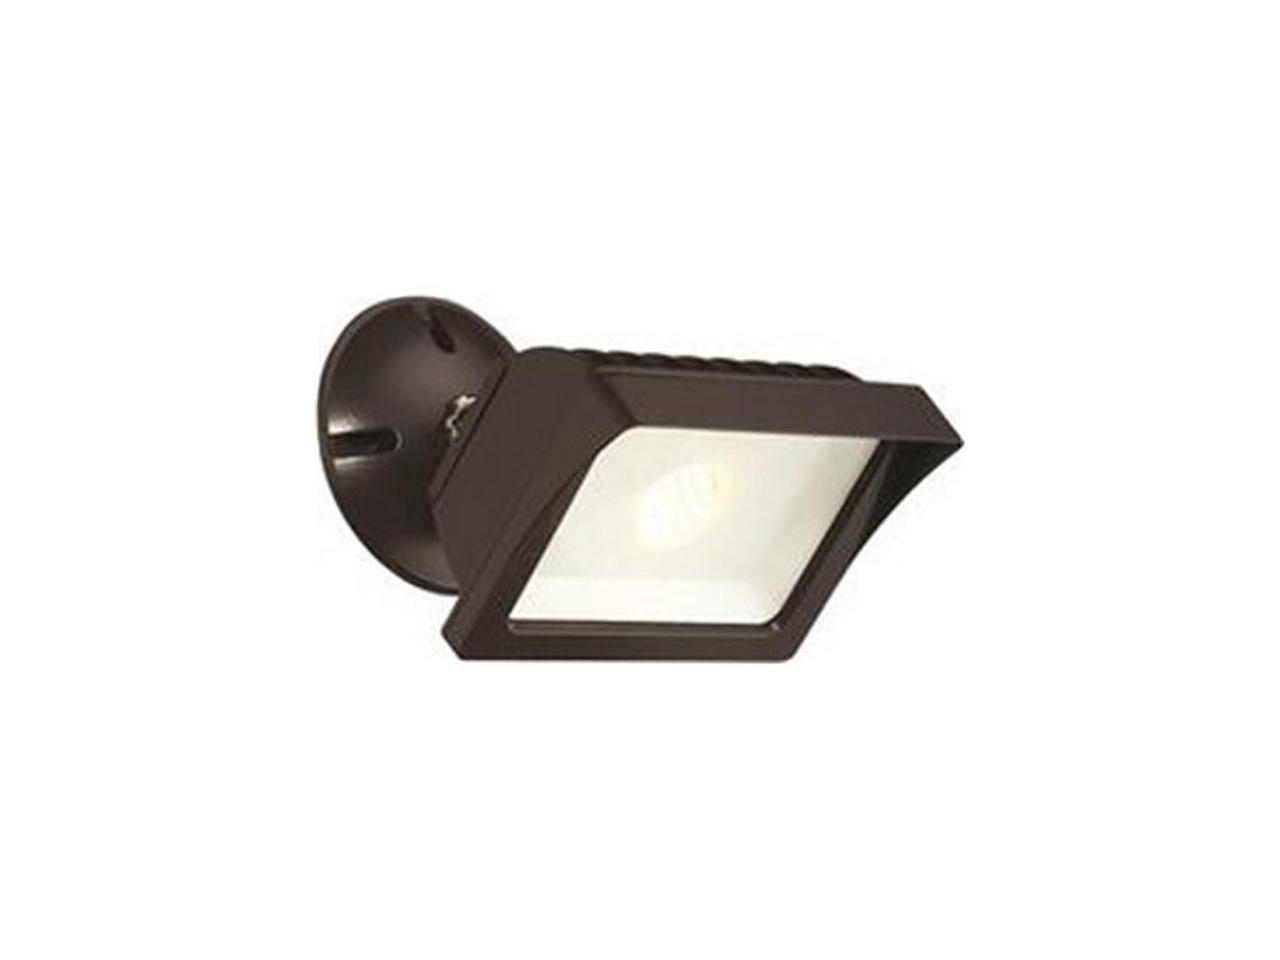 Envirolite 3561922 Led Adjustable Single Head Outdoor Wall Flood Light Bronze Integrated Led Included Newegg Com